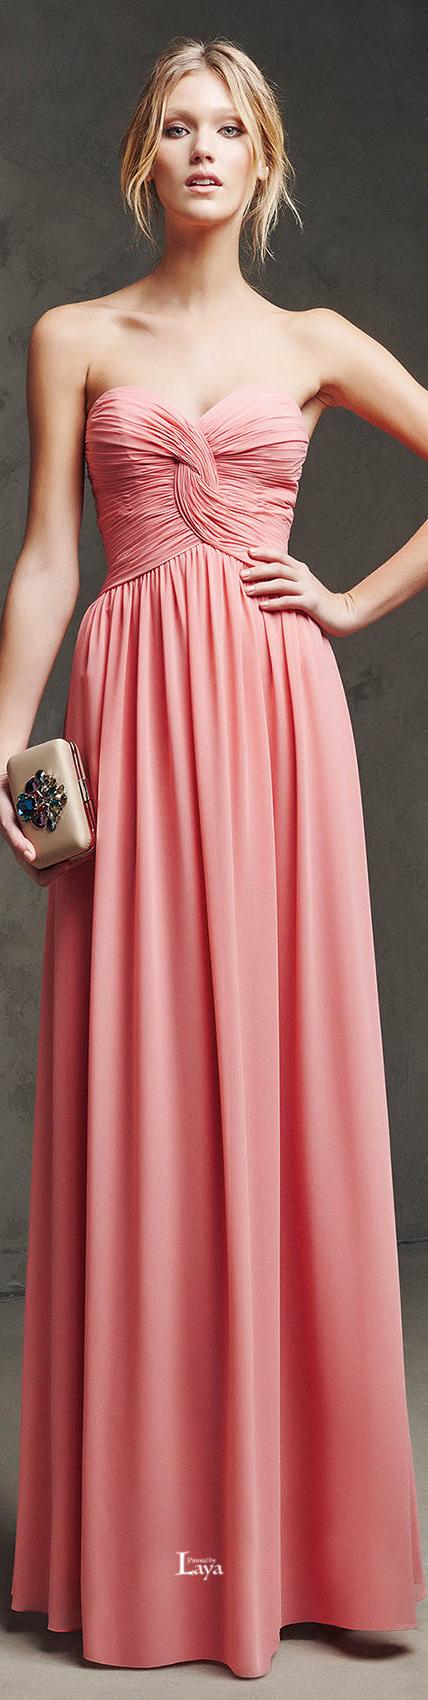 Pronovias 2016 EVENING Dresses | Fashion | Pinterest | Vestidos ...